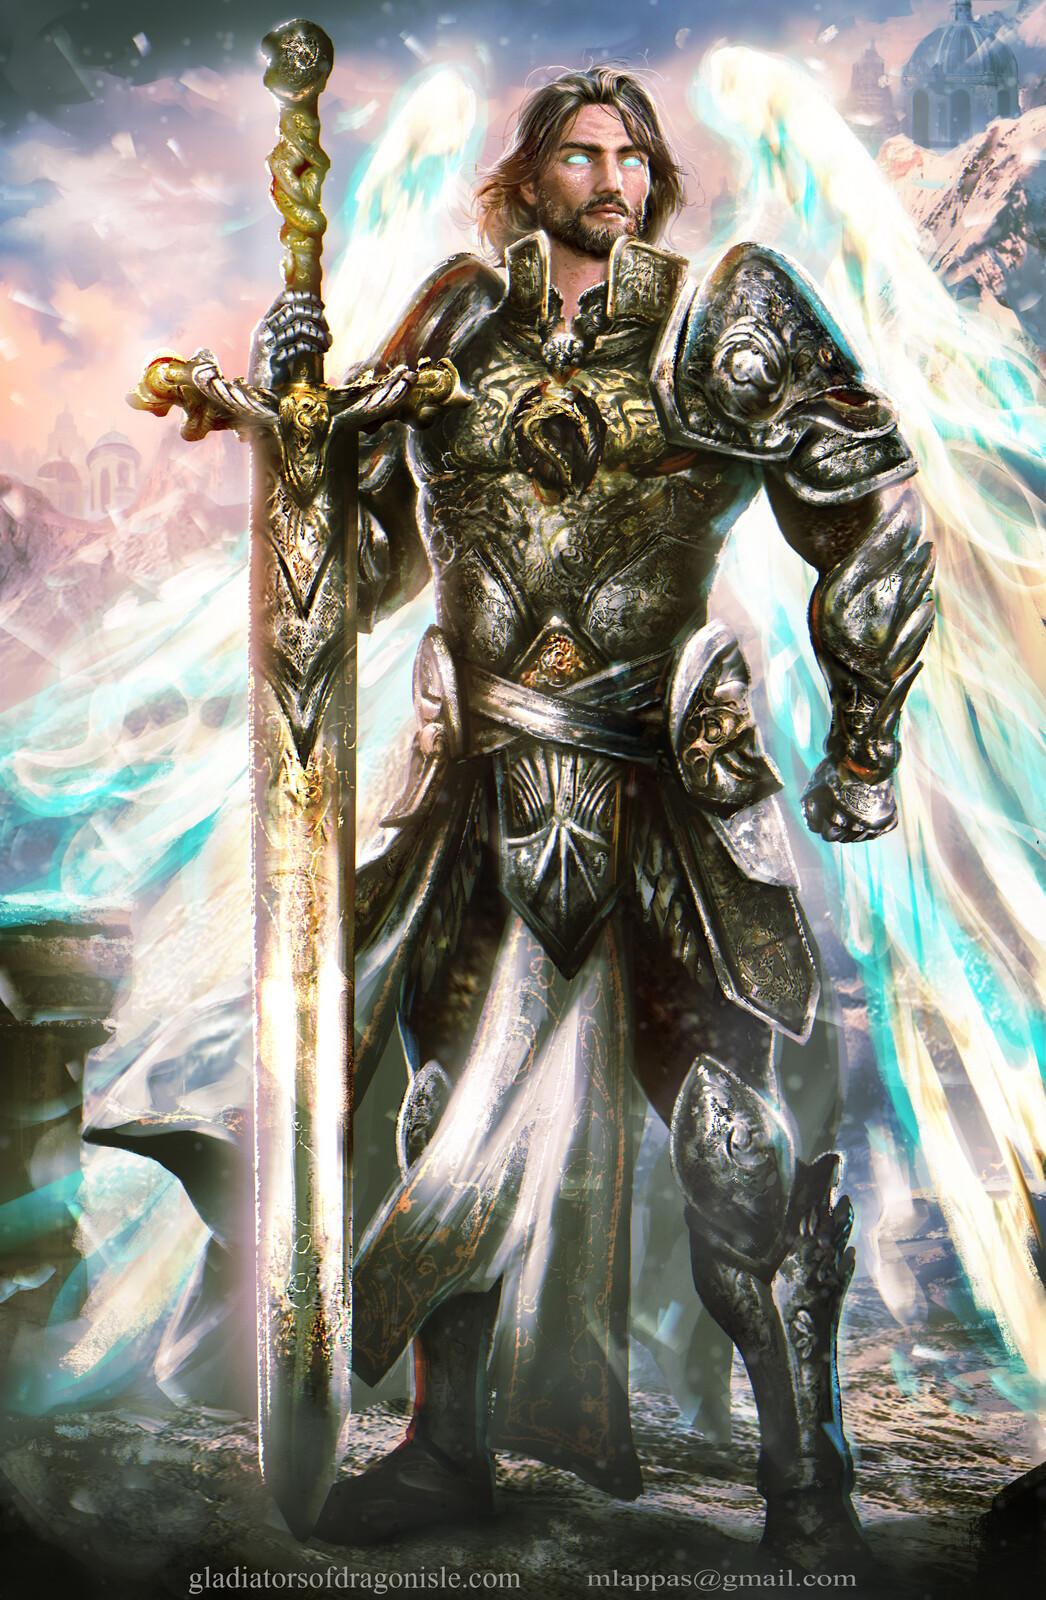 Luther- Gladiators of Dragon Isle